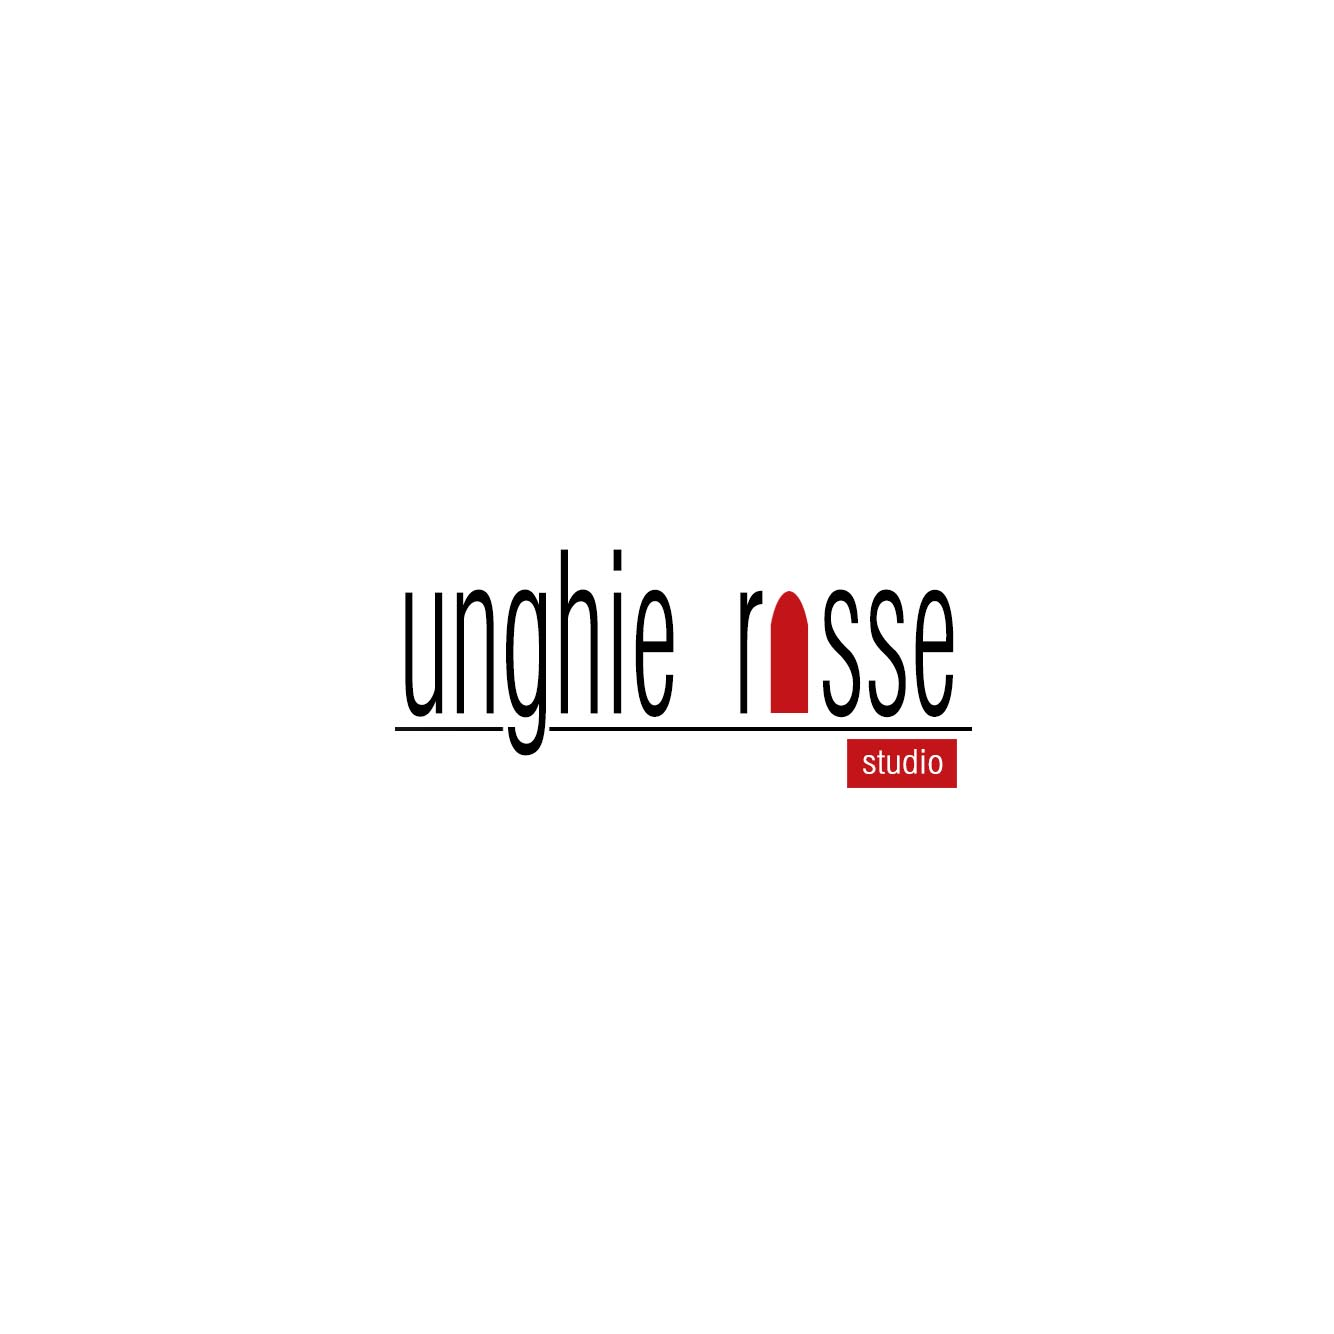 Unghierosse… discover